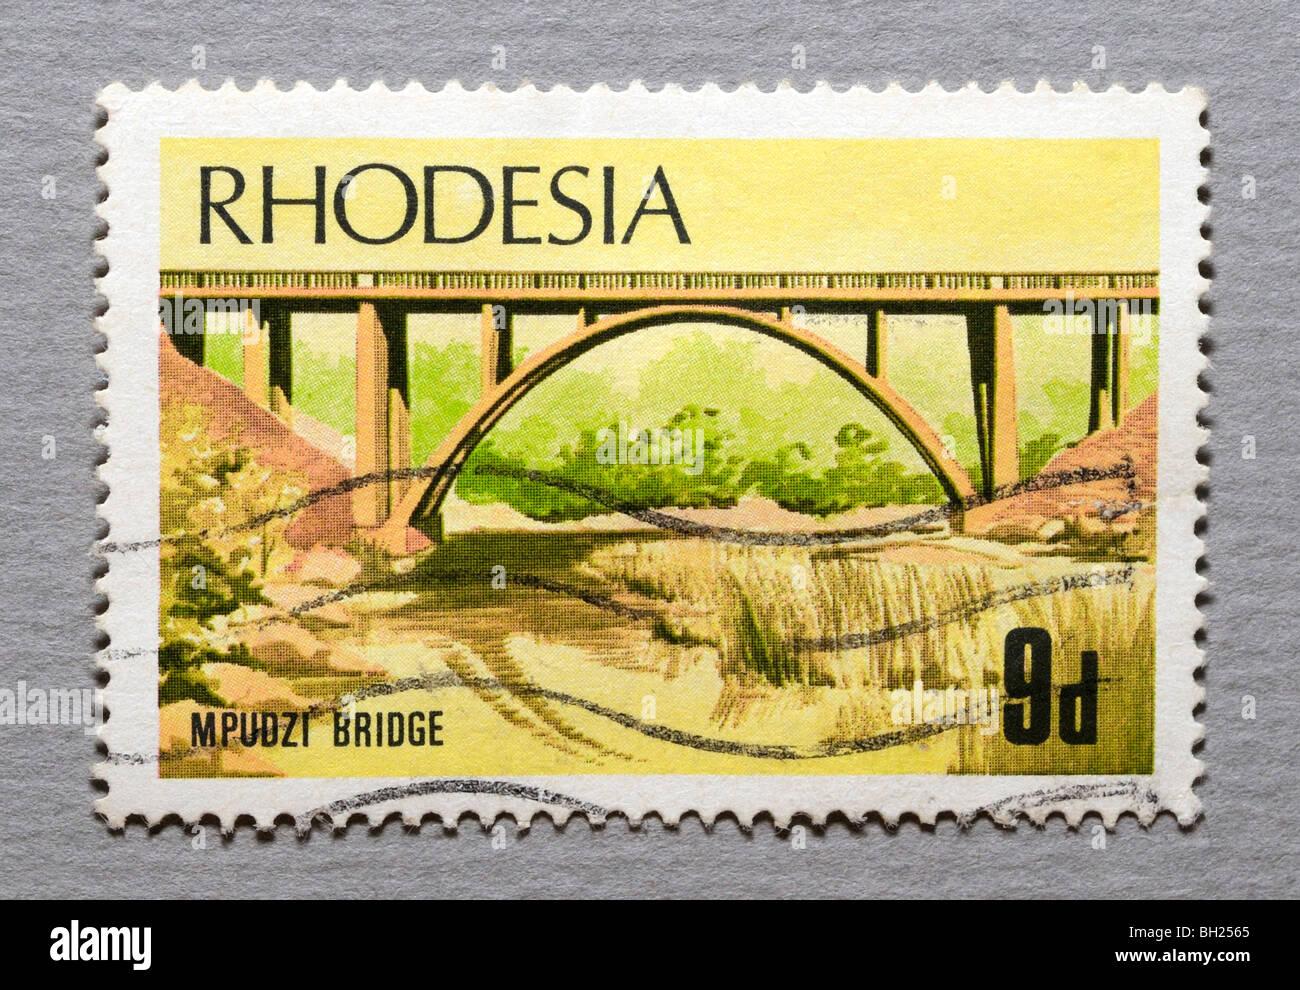 Rhodesia Postage Stamp. - Stock Image